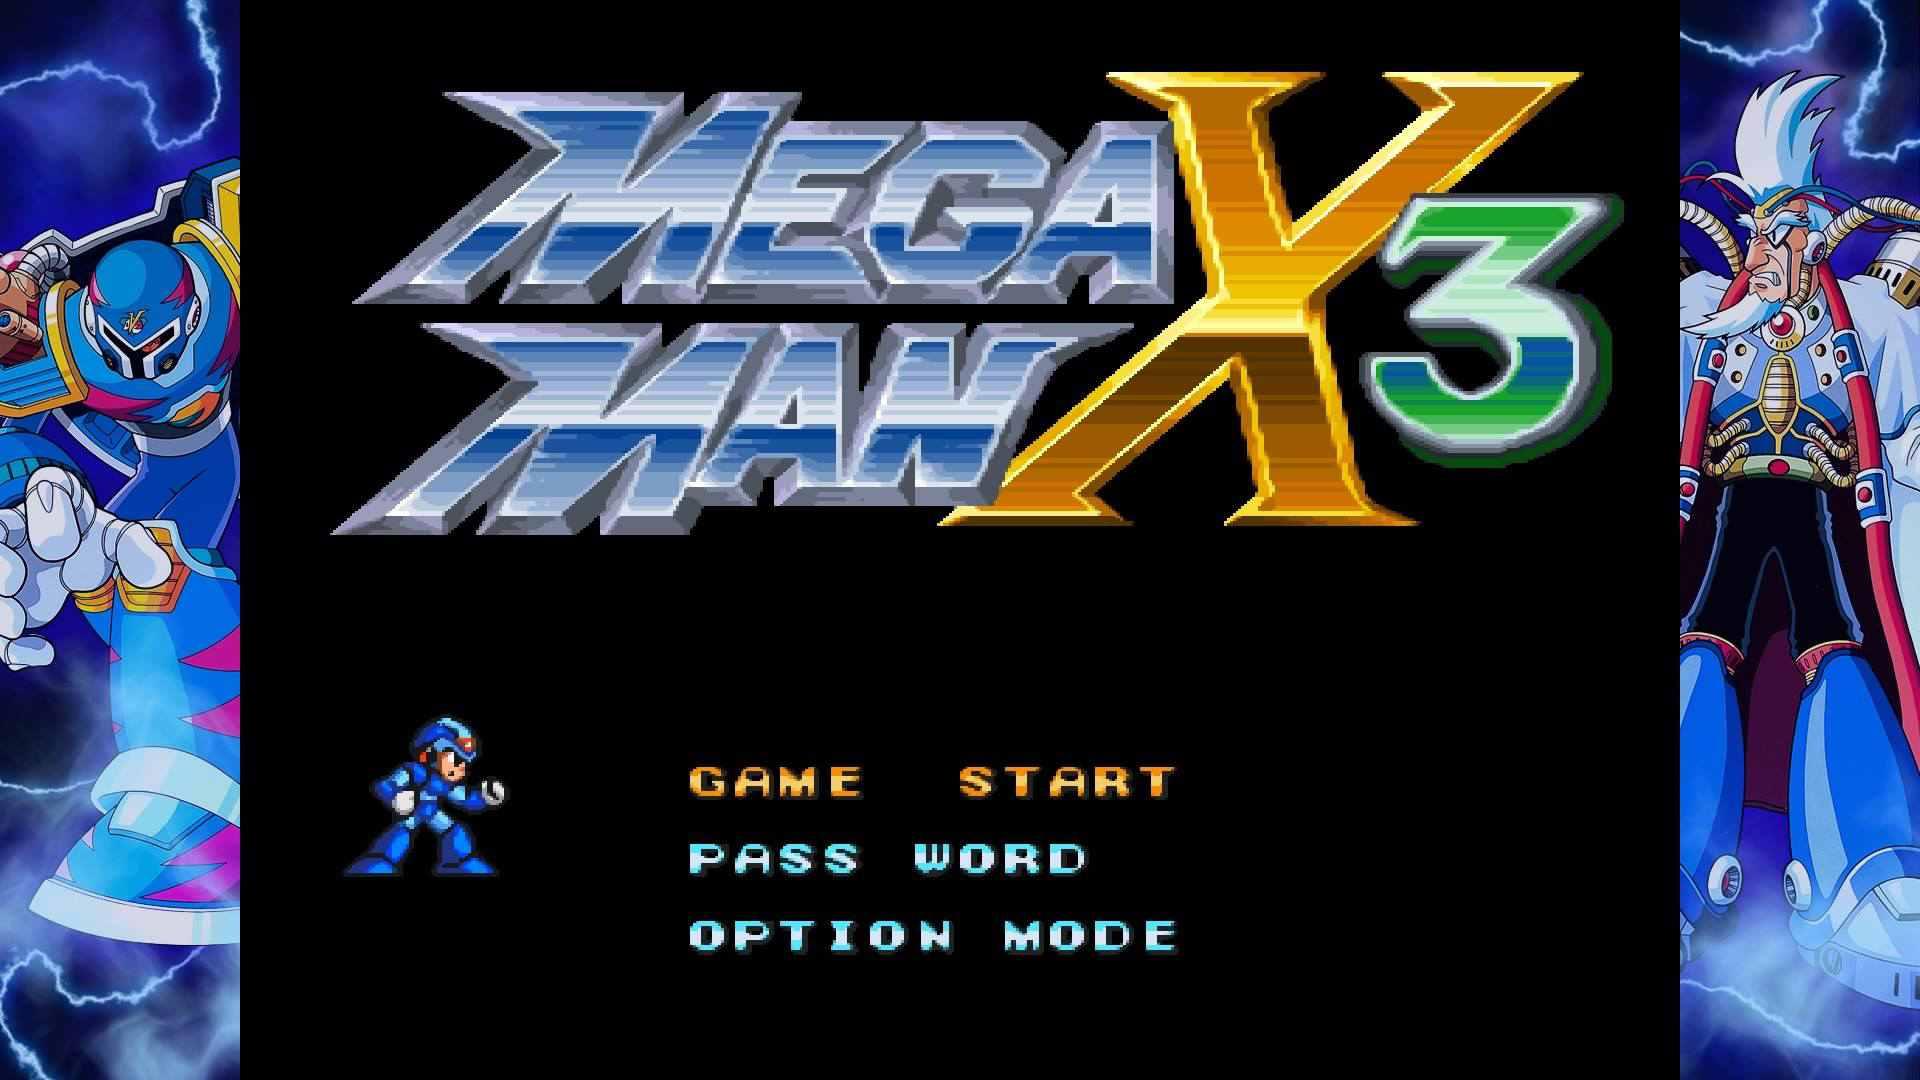 Mega Man X3 was released for multiple platforms in 1995.